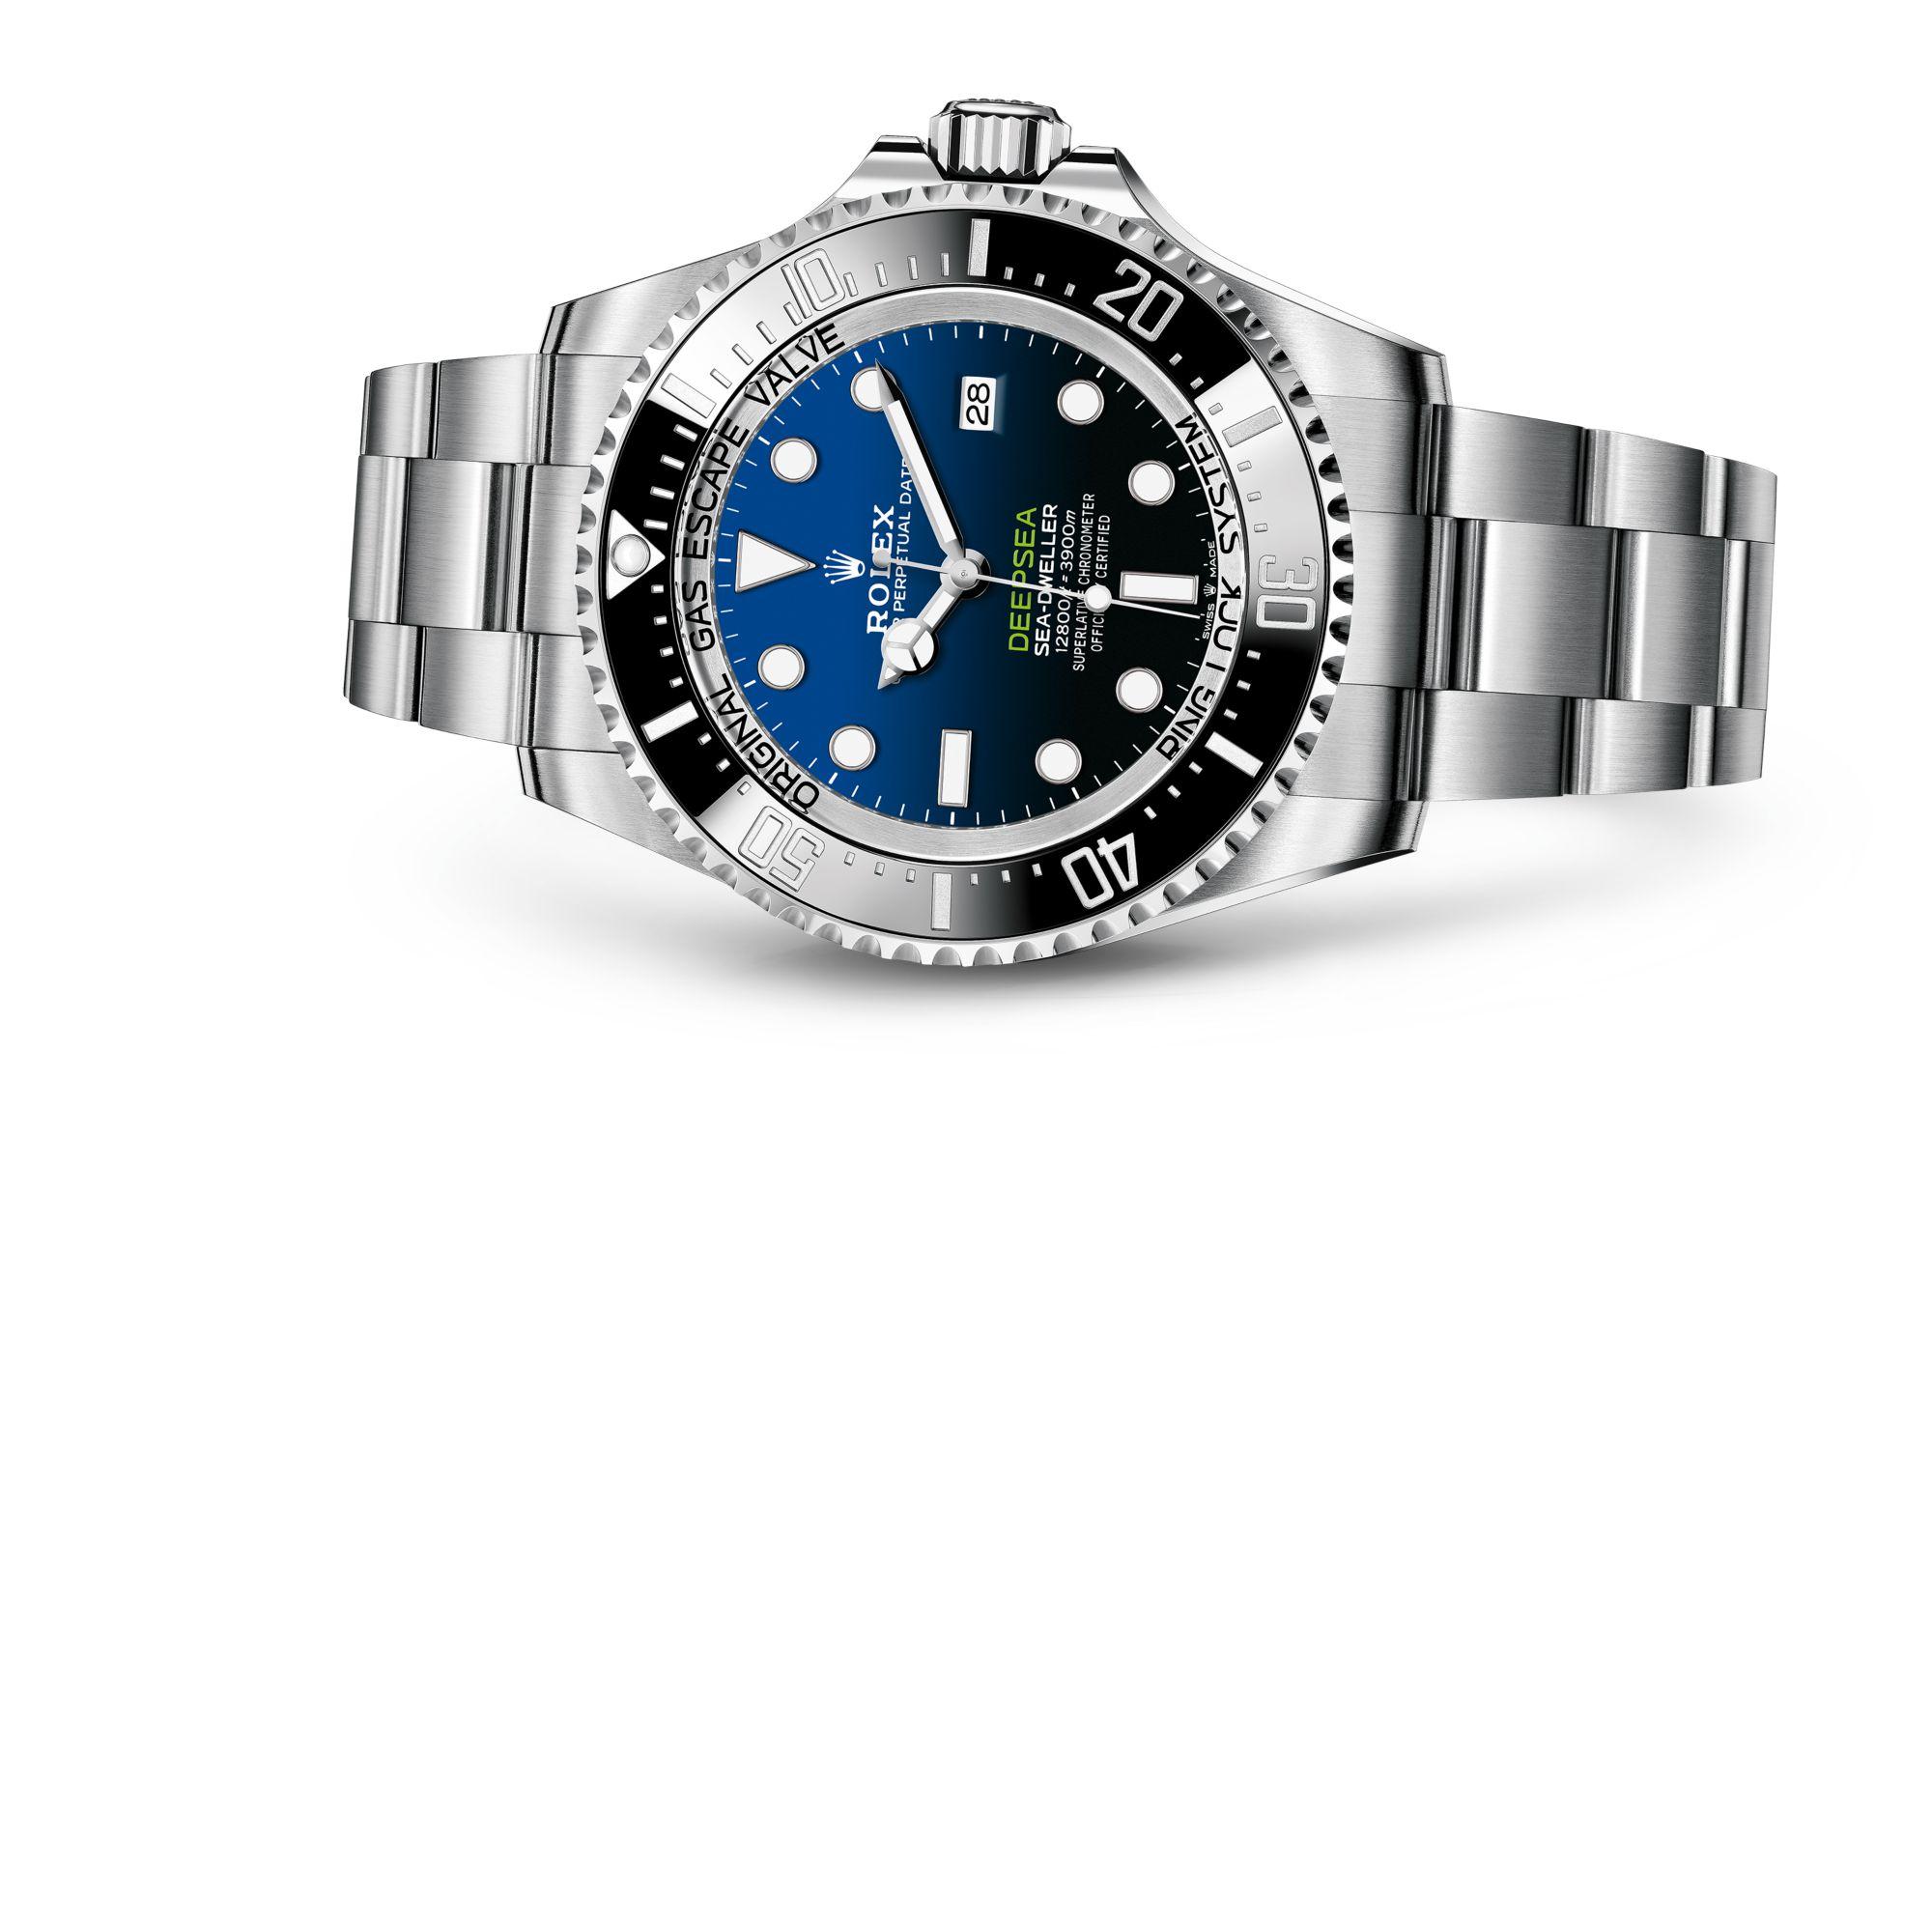 Rolex Rolex Deepsea D-blue dial M126660-0002